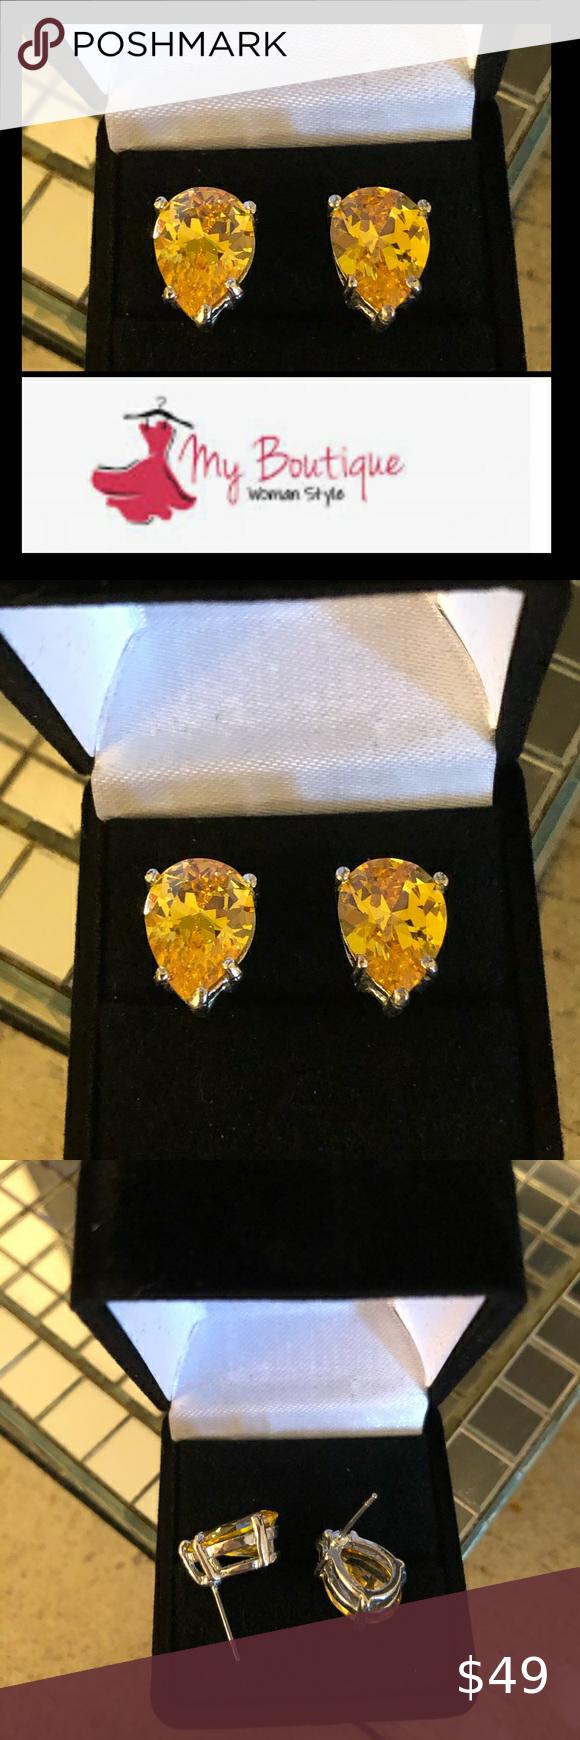 925 Top Quality Canary CZ Pear Shaped Earrings Gorgeous canary color AAAAA top quality CZ pear shap